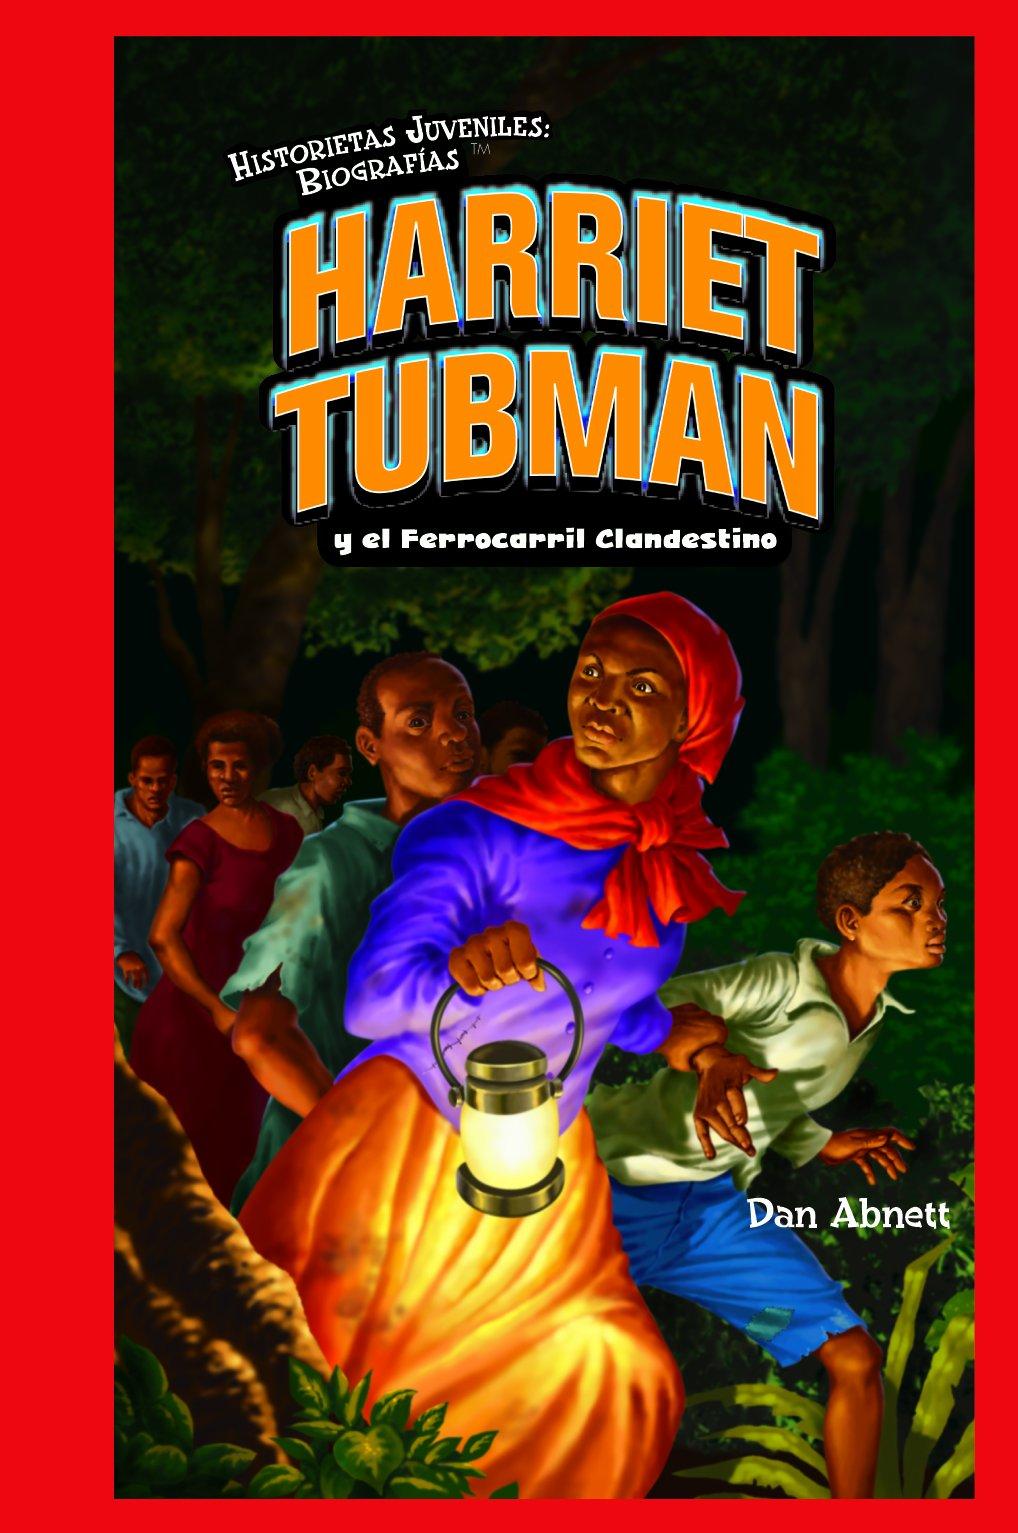 Harriet Tubman y el Ferrocarril Clandestino / Harriet Tubman and the Underground Railroad (Historietas Juveniles: Biografias/ Jr. Graphic Biographies) (Spanish Edition)